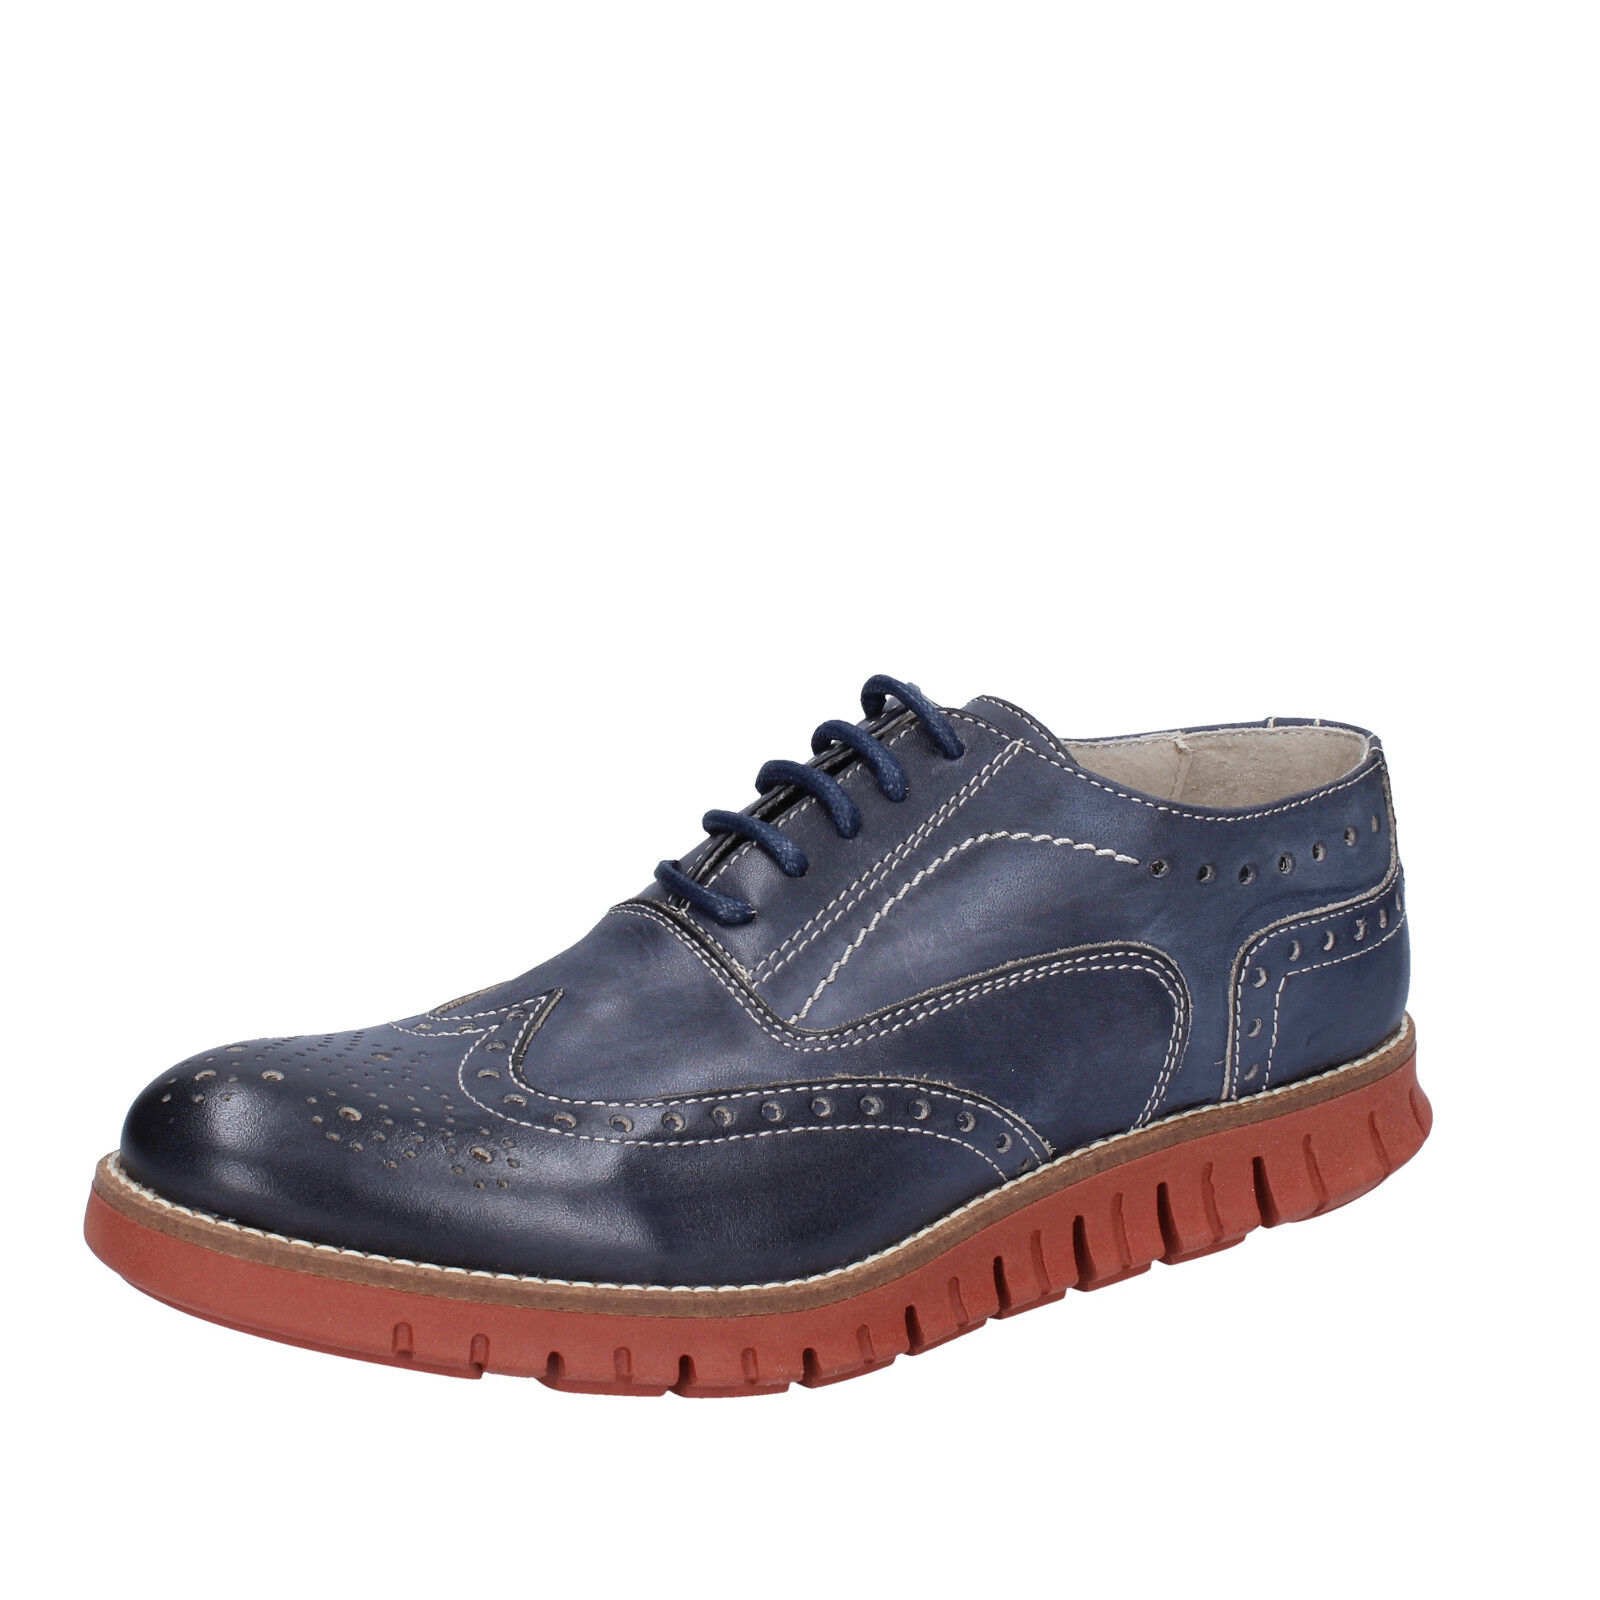 Mens shoes OSSIANI 8 (EU 42) elegant bluee leather BT857-42